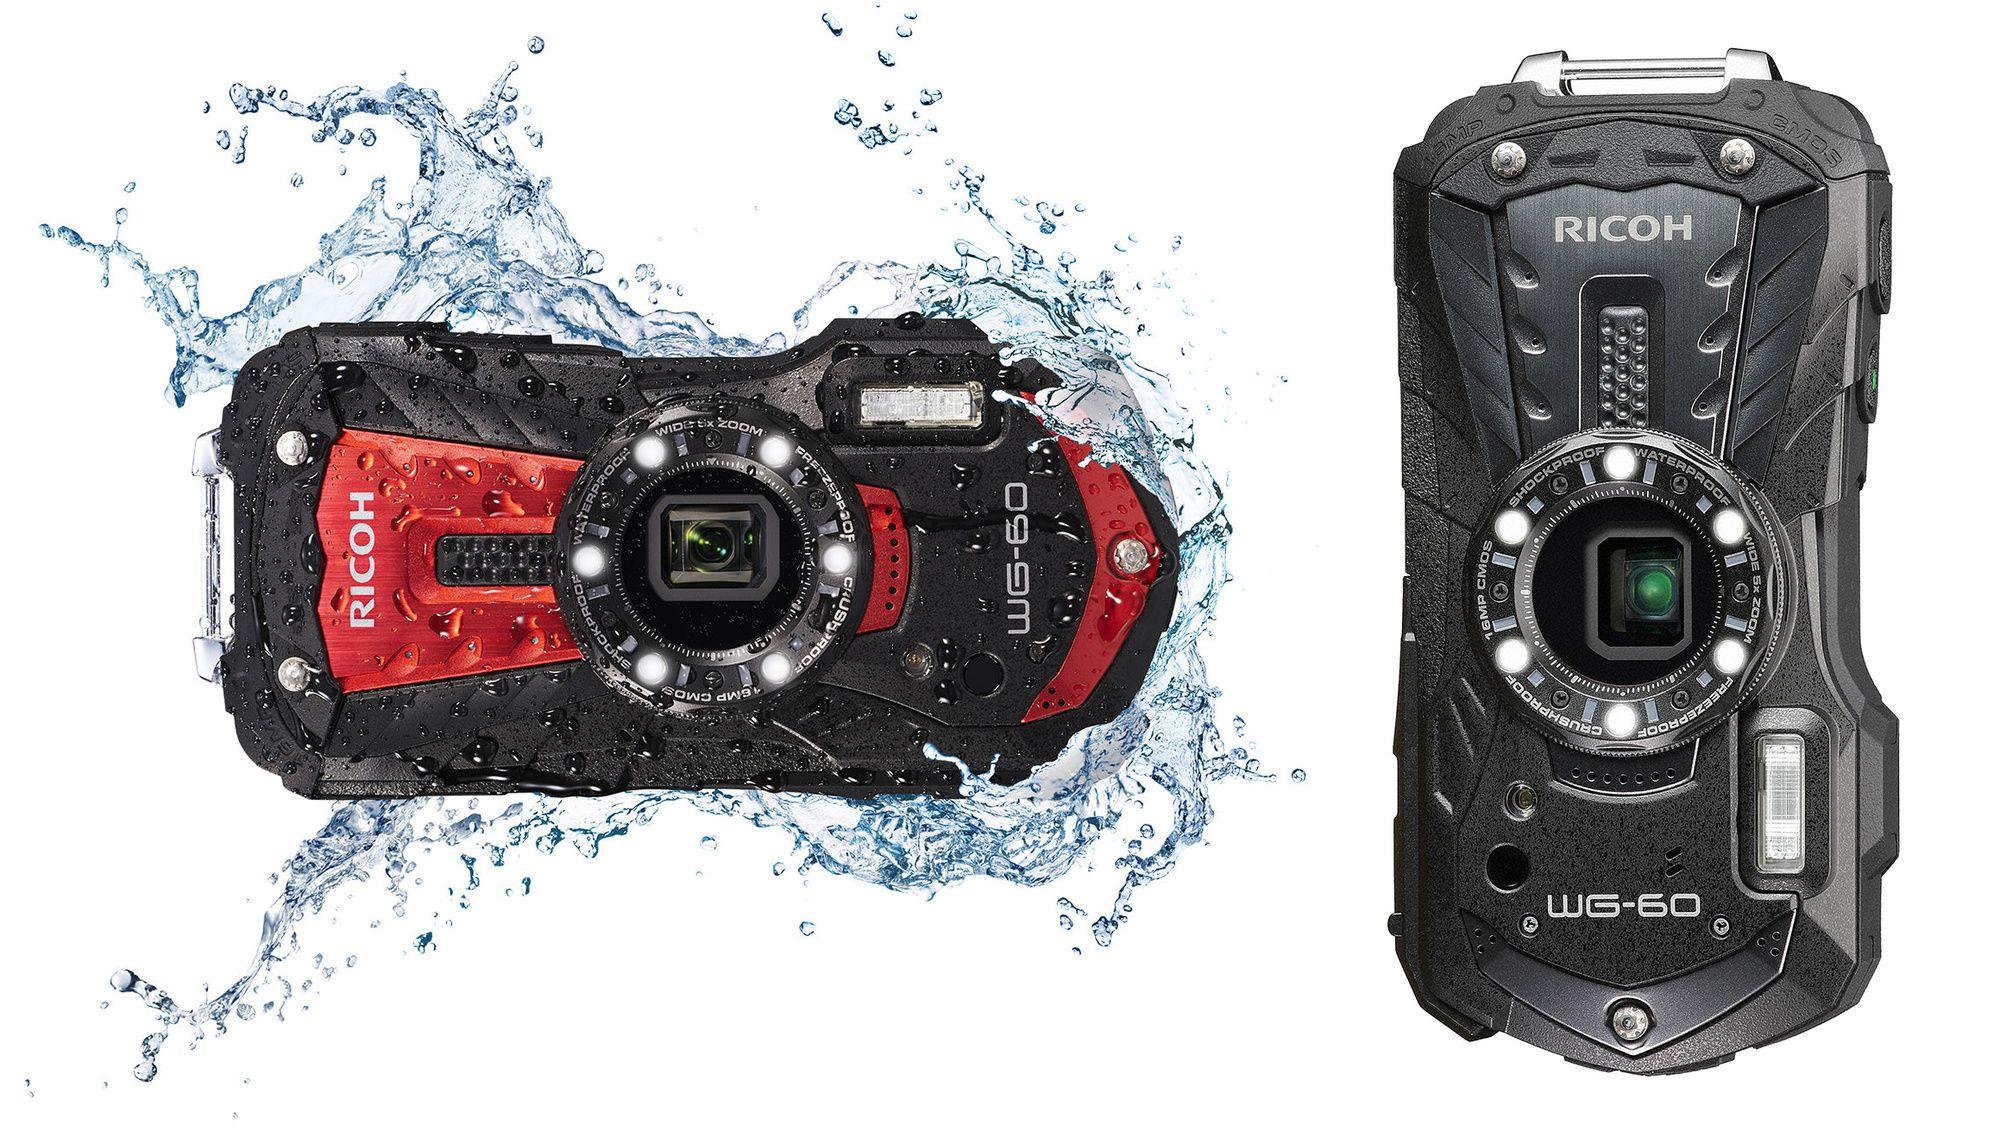 ricoh wg-60 zwart en rood